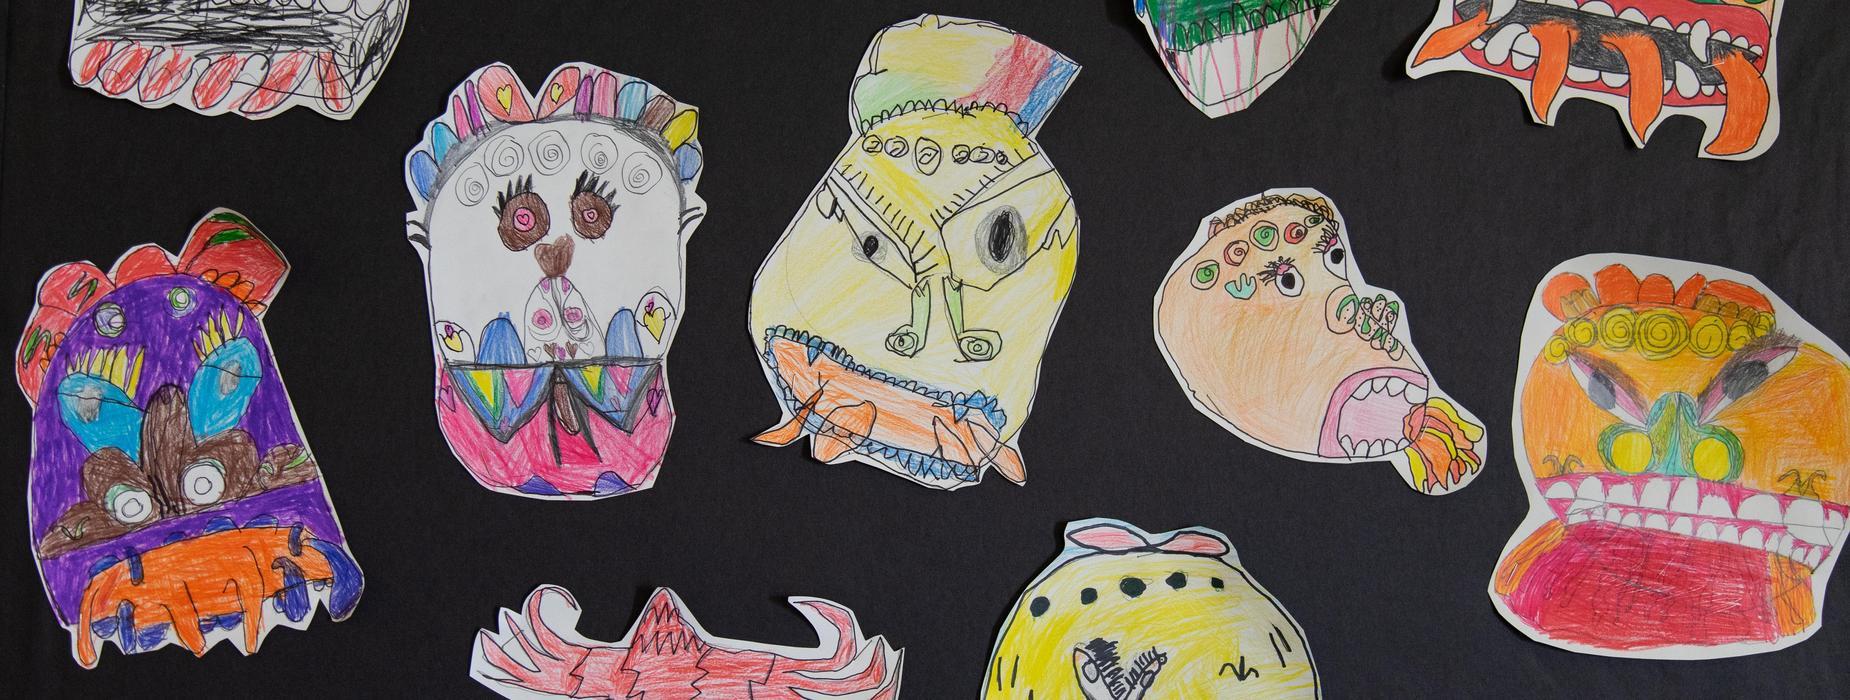 Marguerita student art work